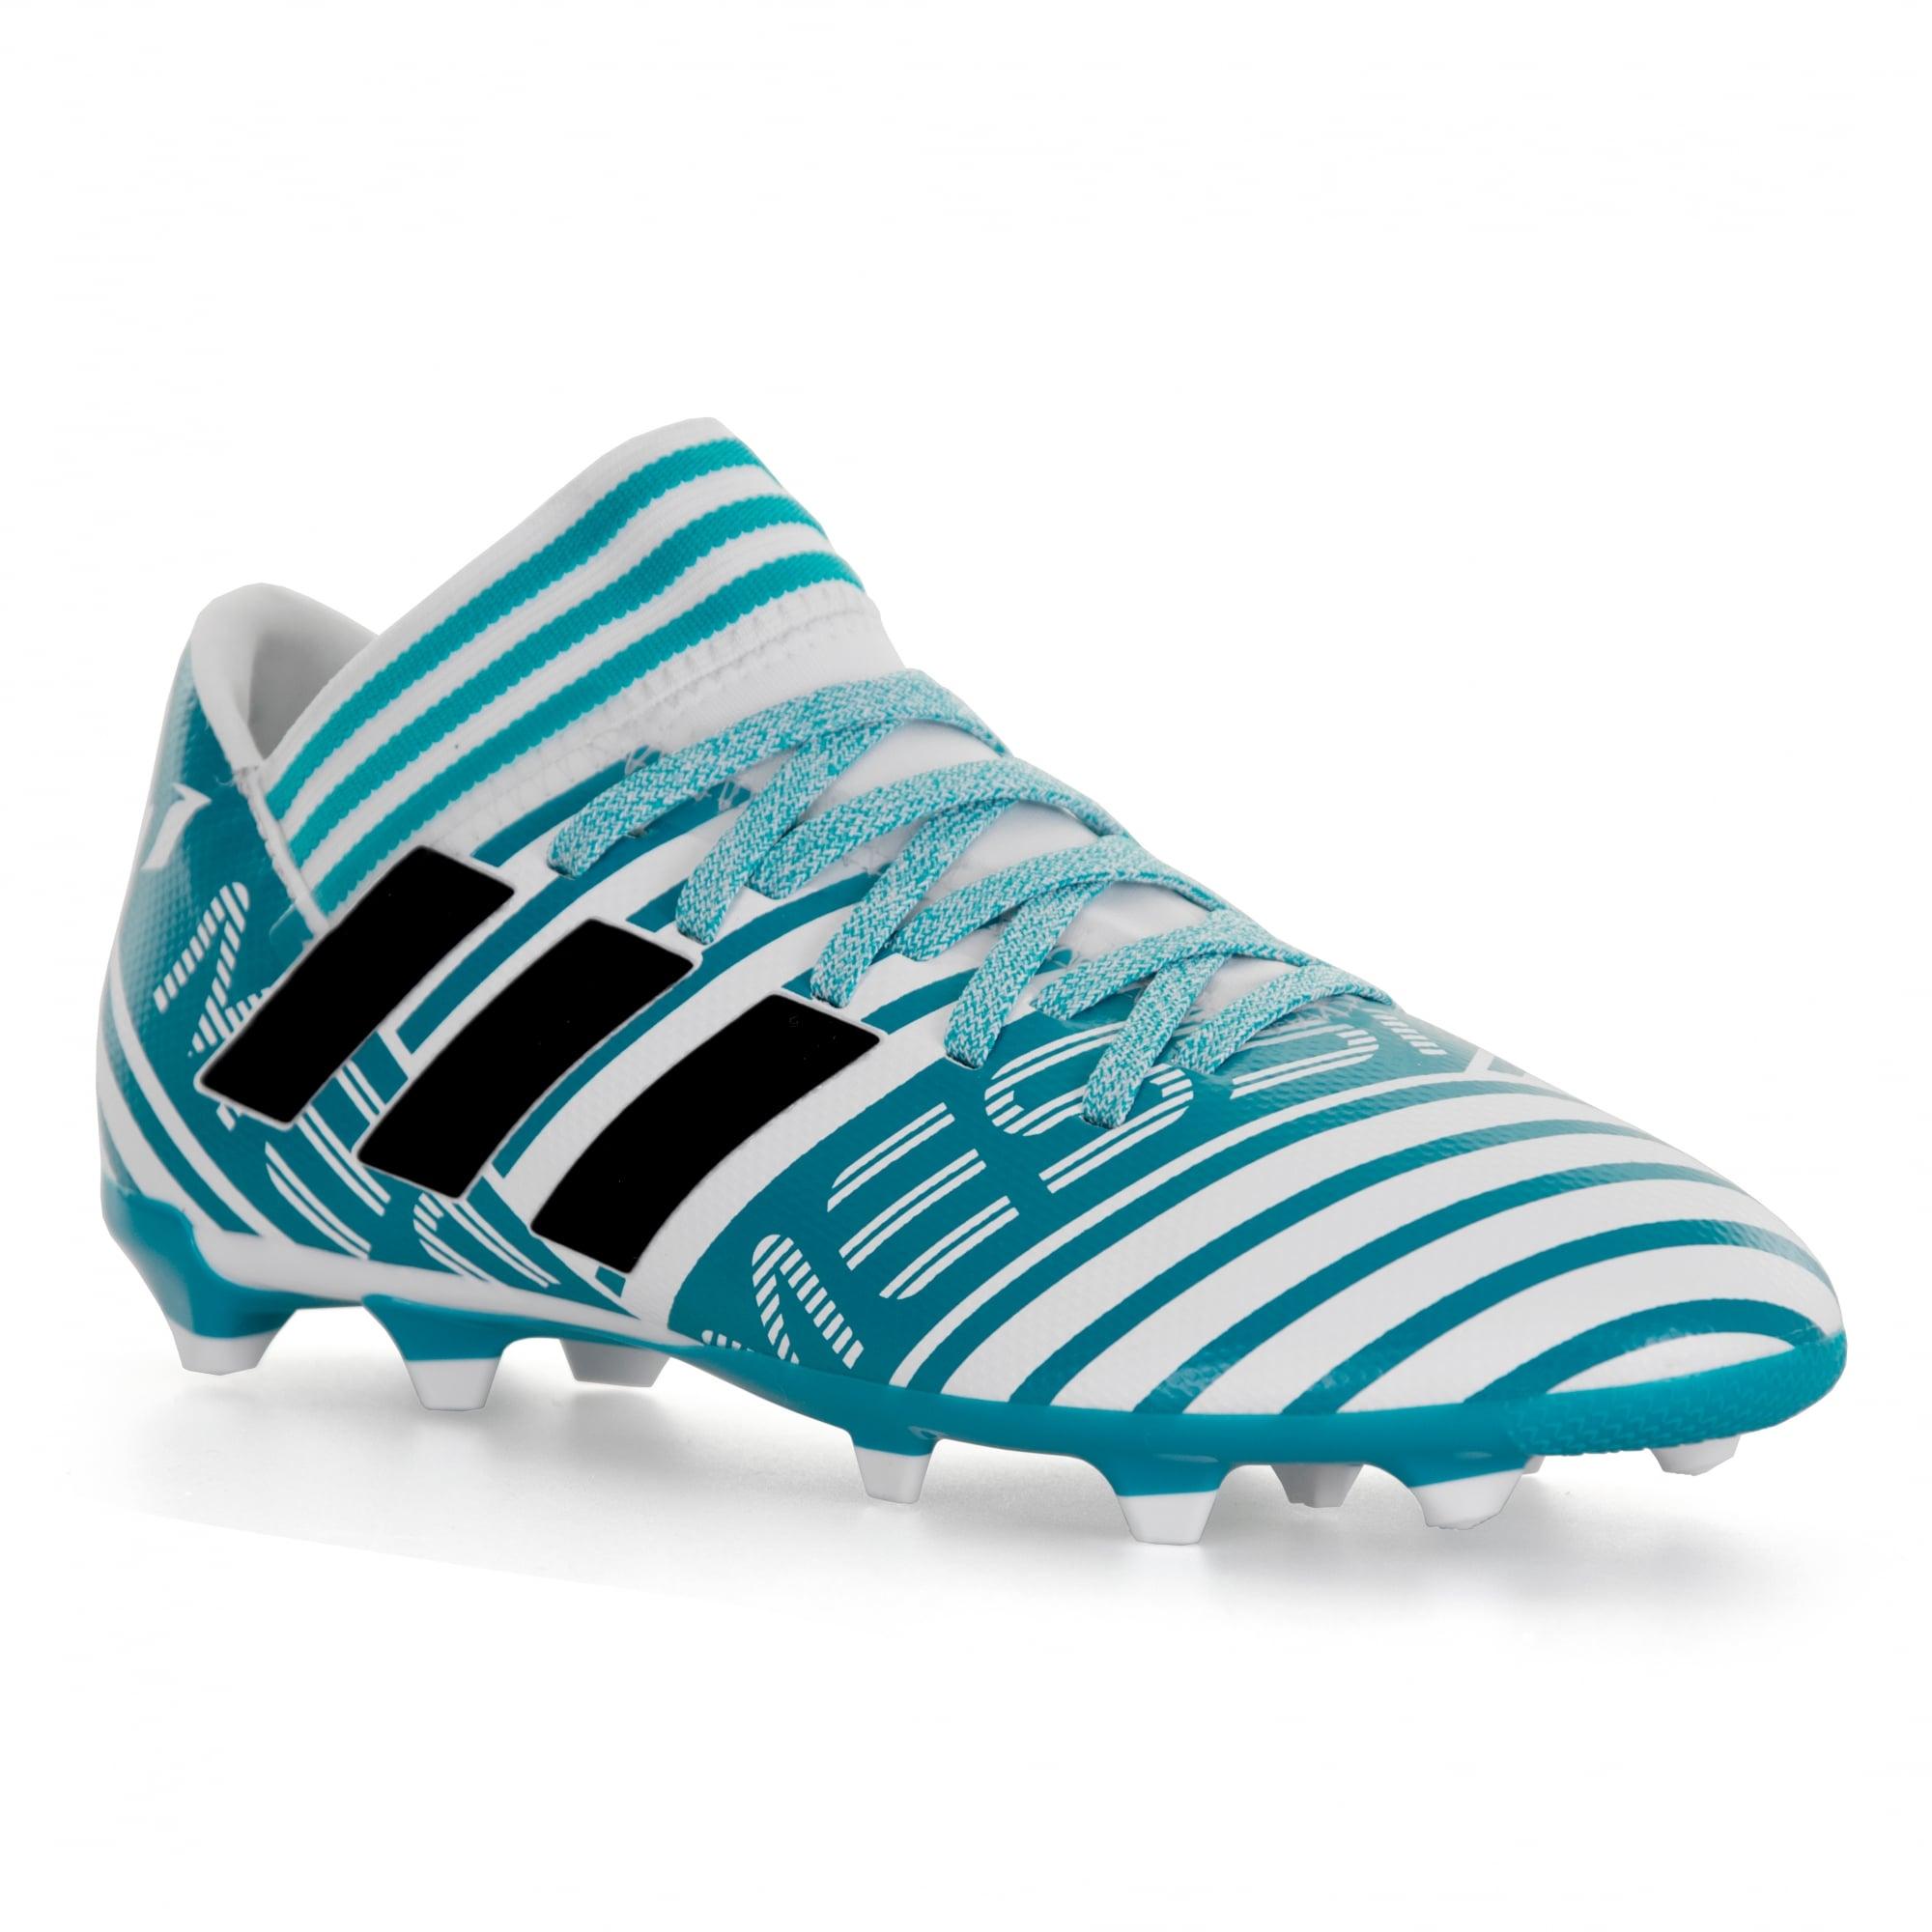 Adidas-Performance-Juniors-Nemeziz-Messi-17-3-FG-